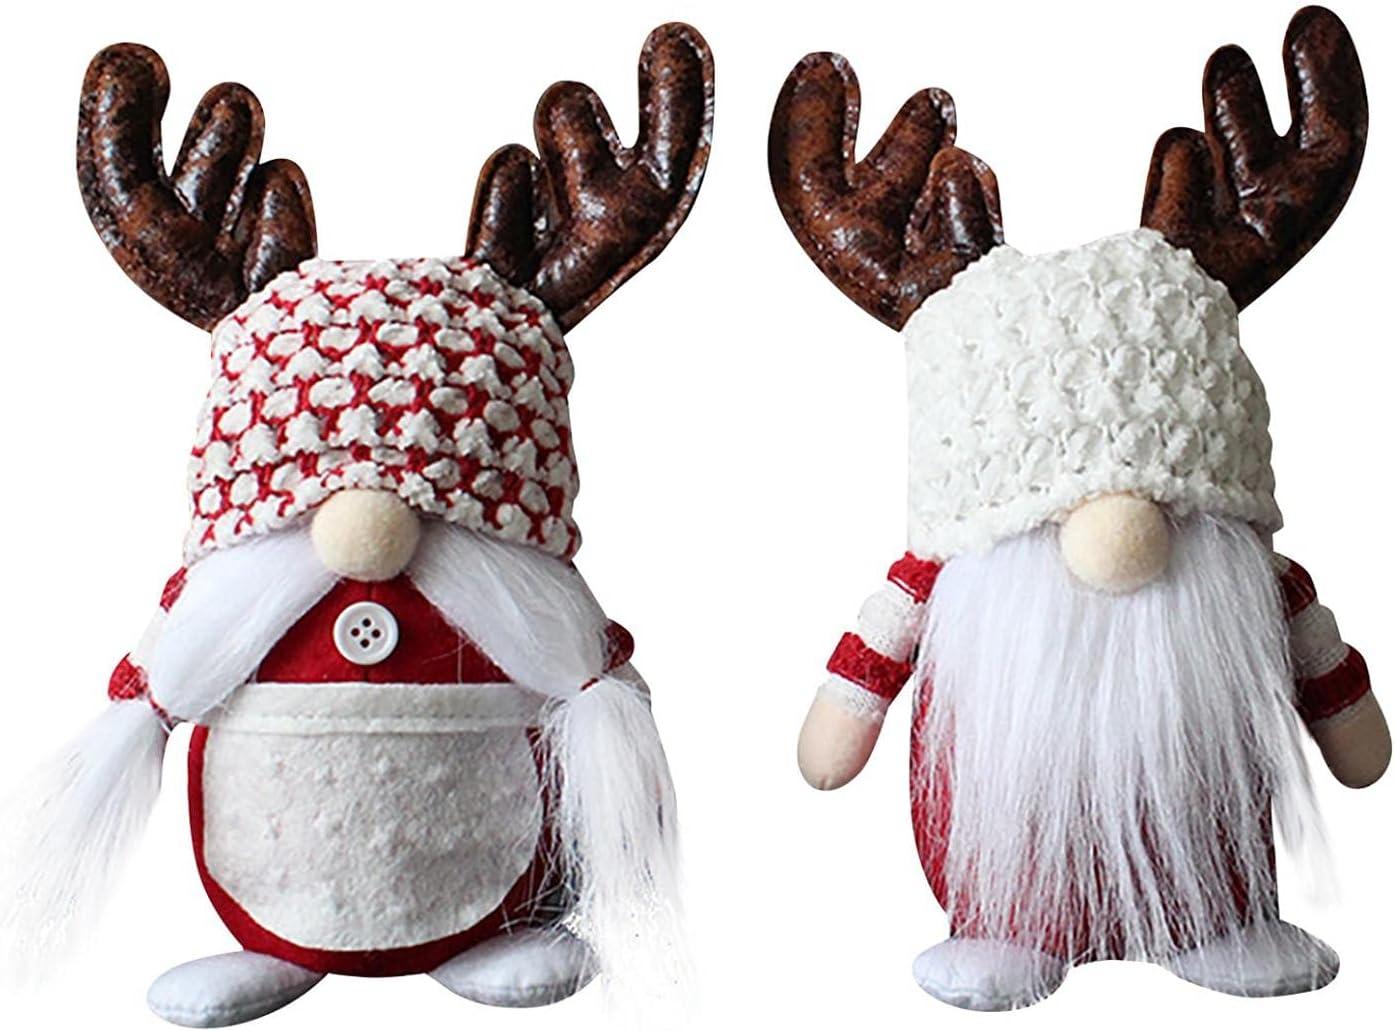 IDALL Ranking TOP9 At the price Cute Santa Claus Dwarf Plush Elfs Doll Antlers R Christmas